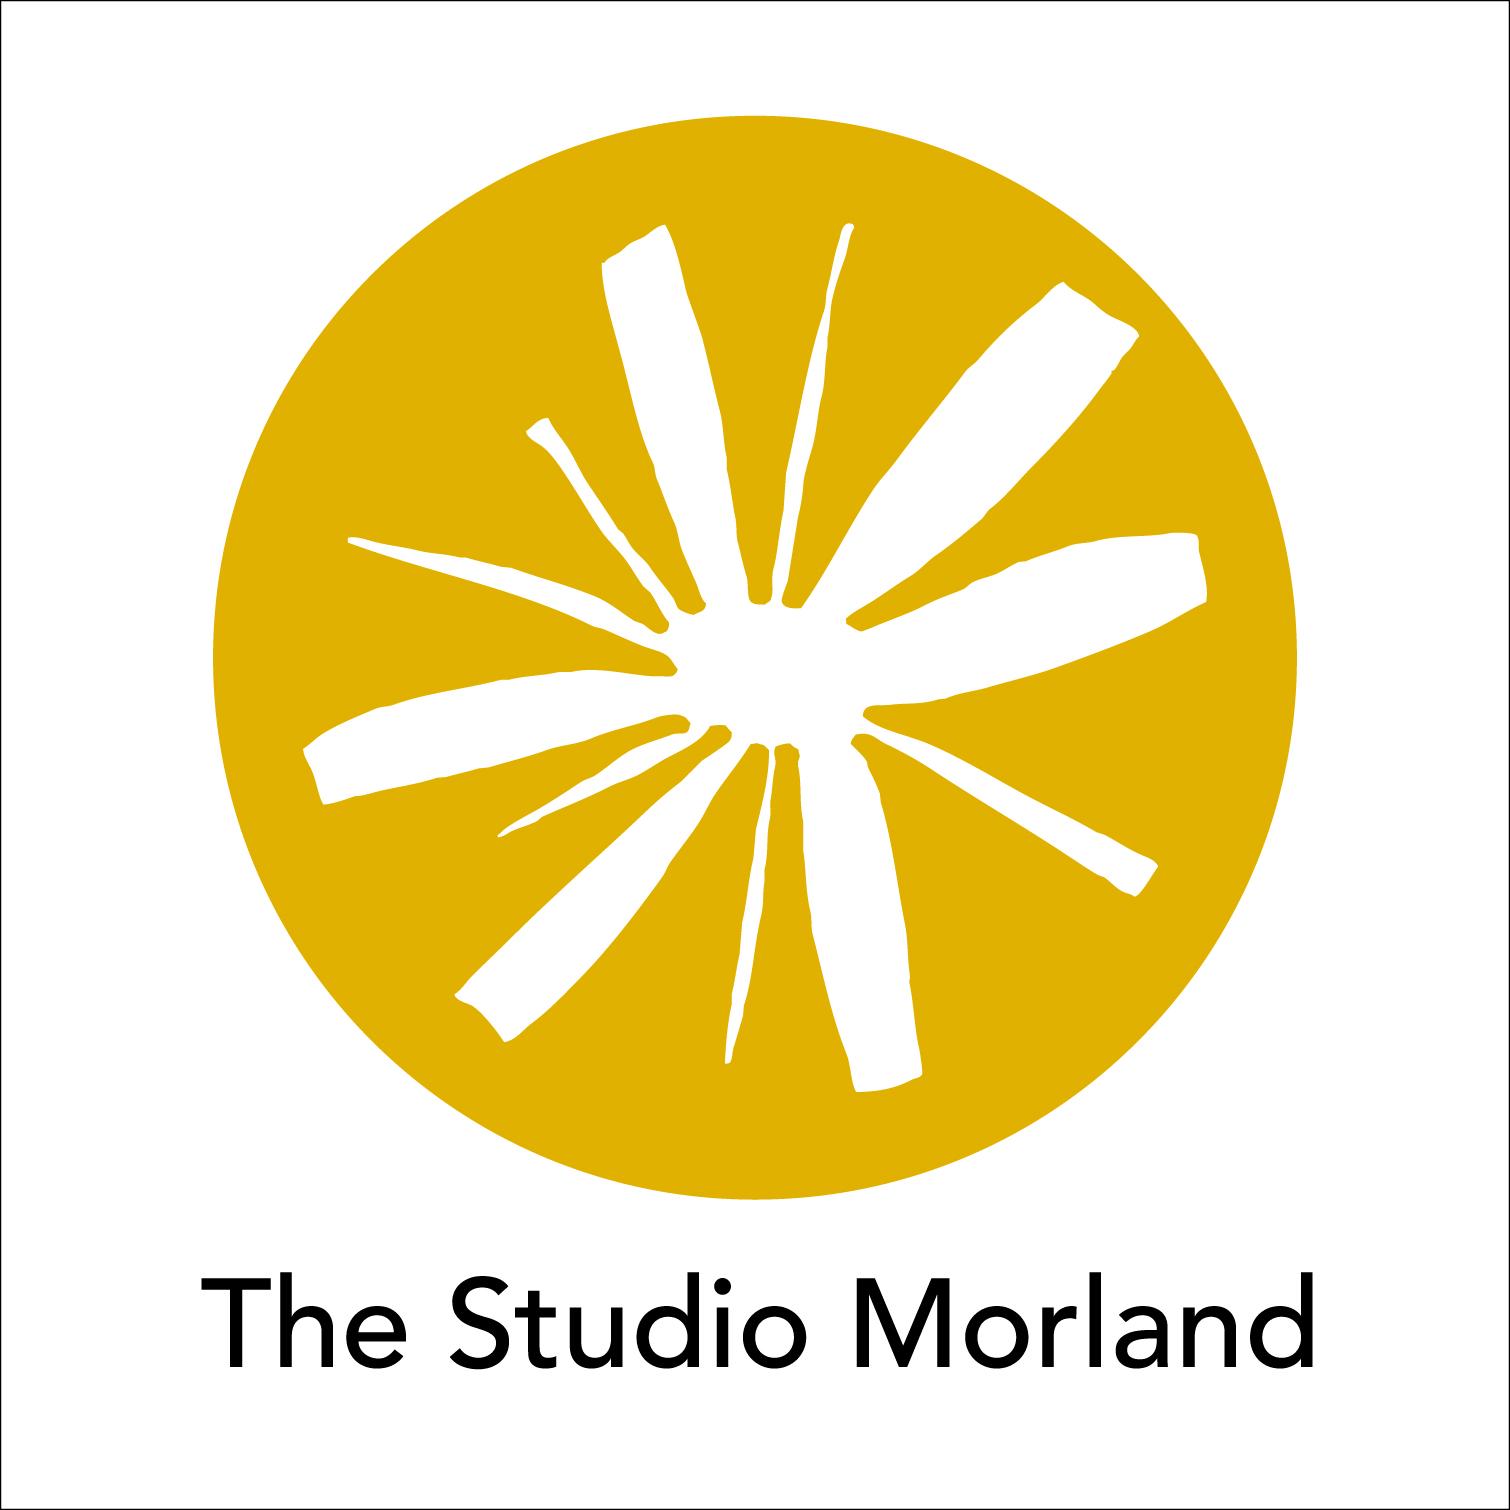 The Studio Morland - logo in colour